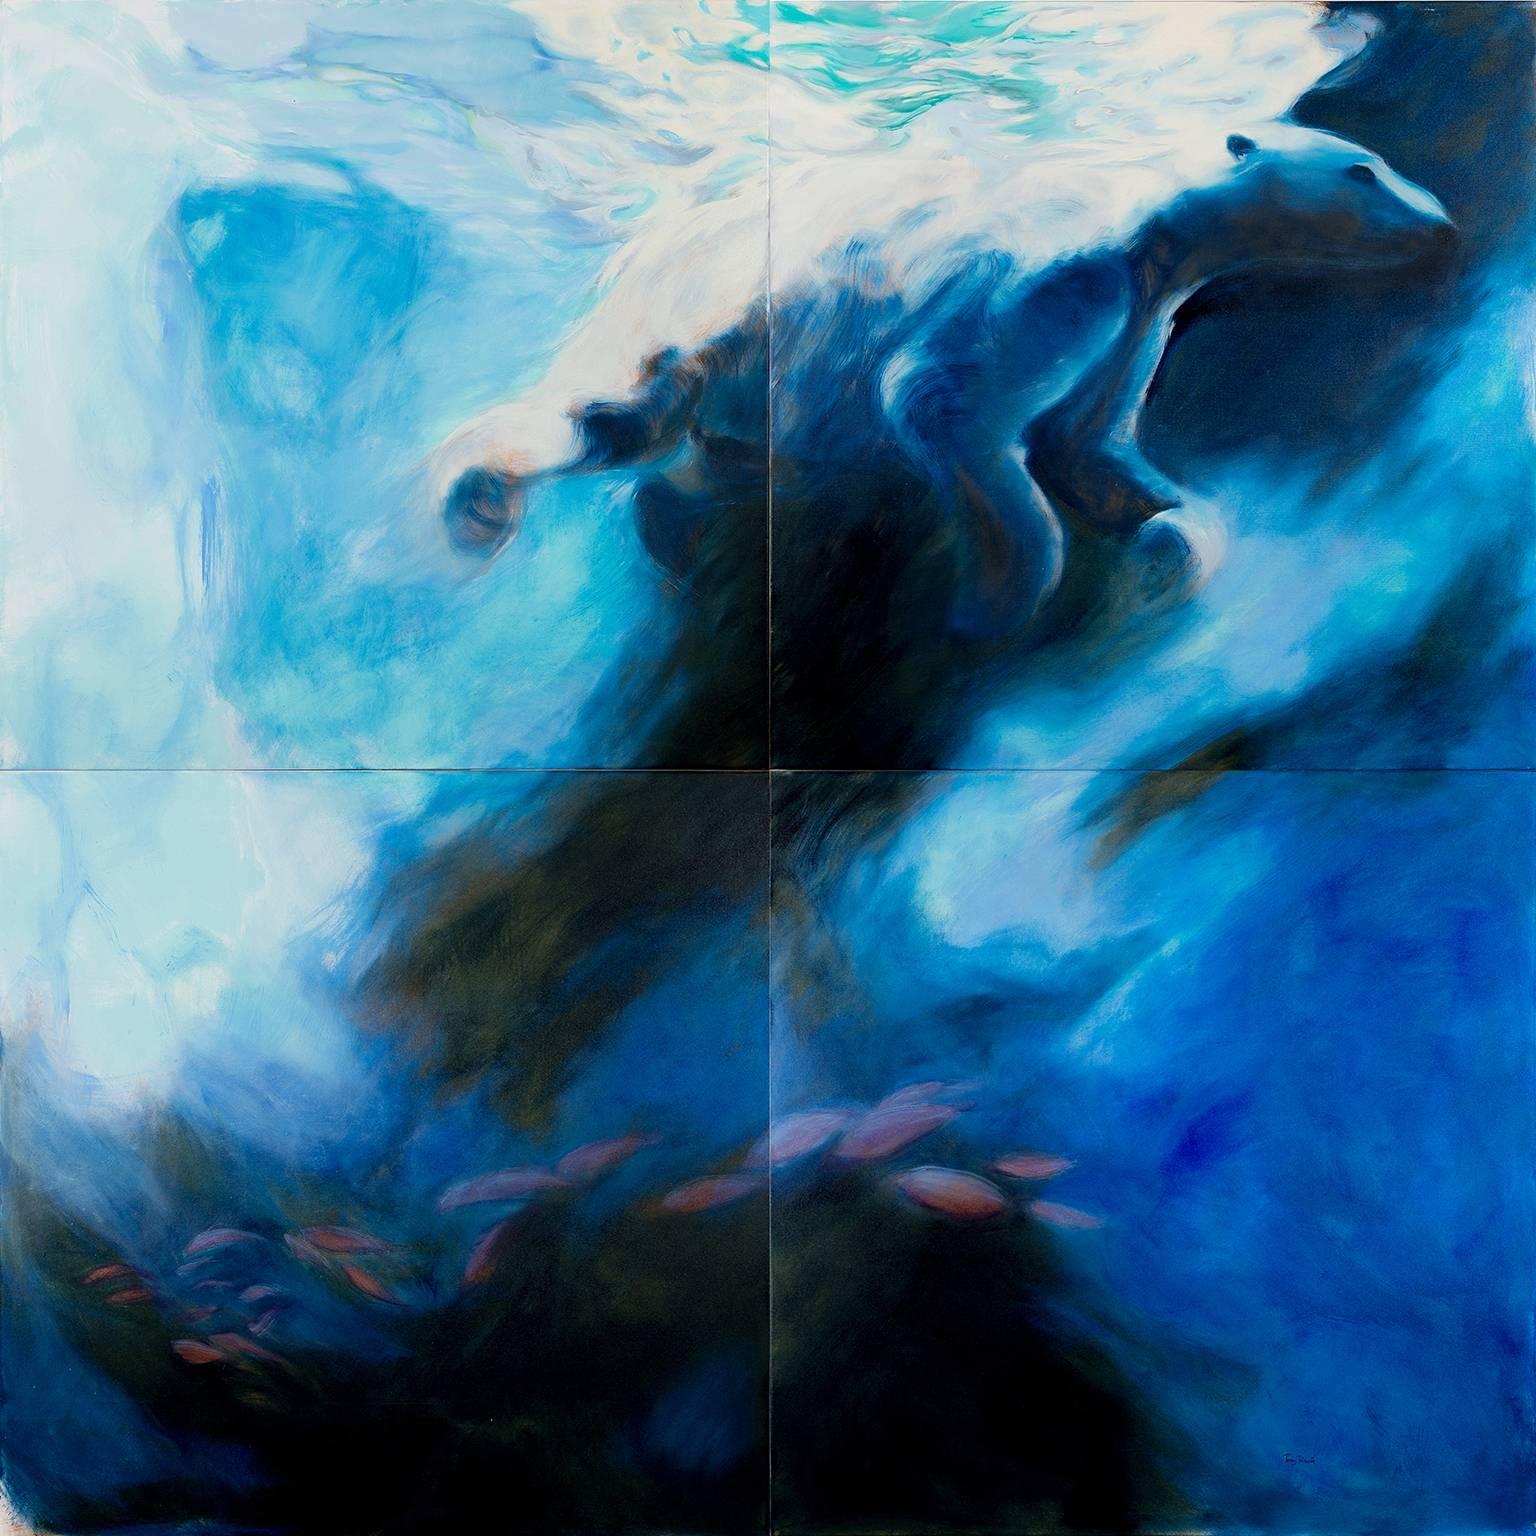 Polar Bear 'Ours'  by Perez Petriarte on Canvas